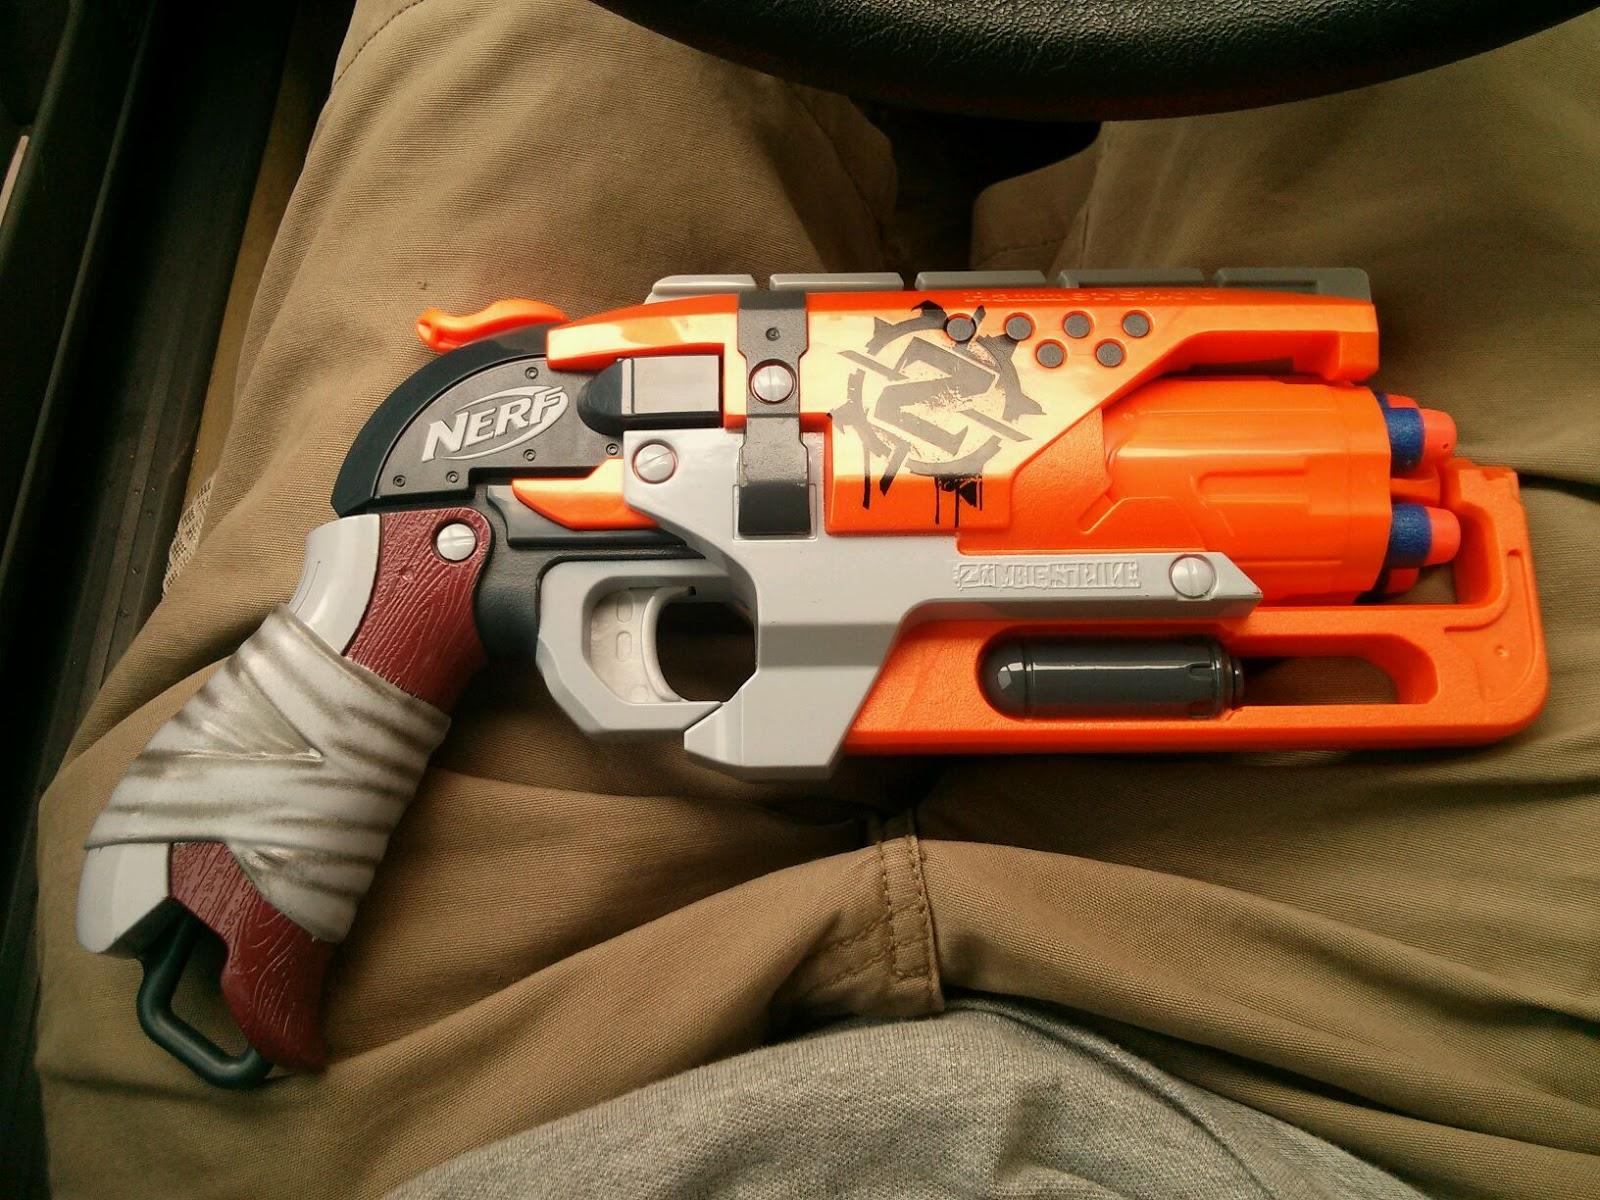 Baidu Nerf Zombie Strike Hammer Shot in grey trigger